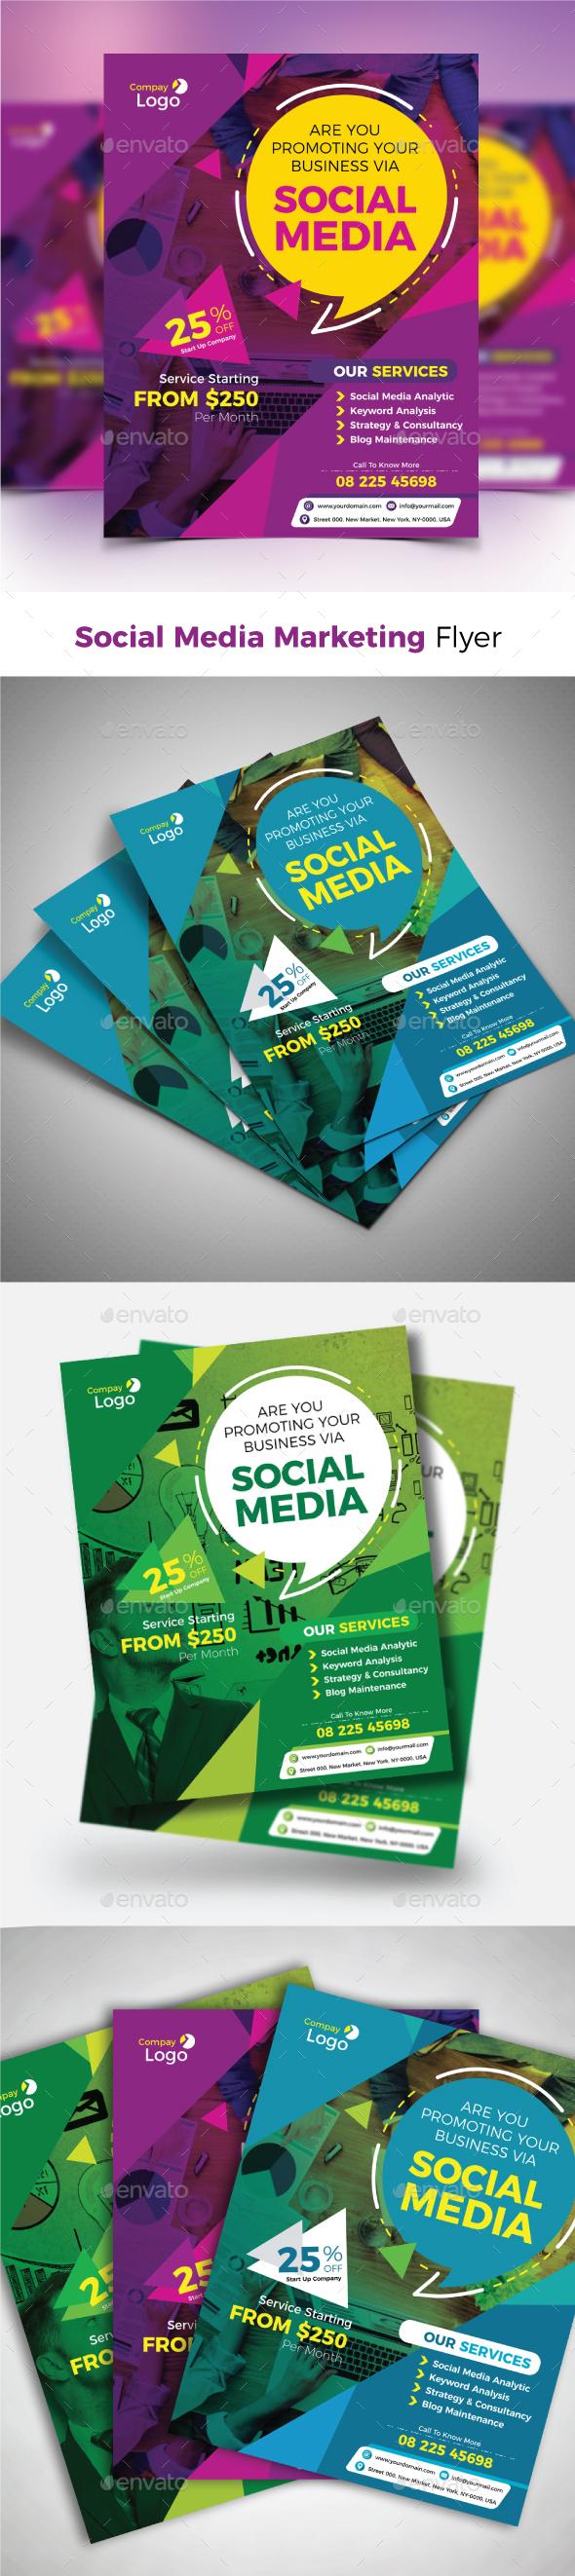 GraphicRiver Social Media Marketing Flyer 21182044